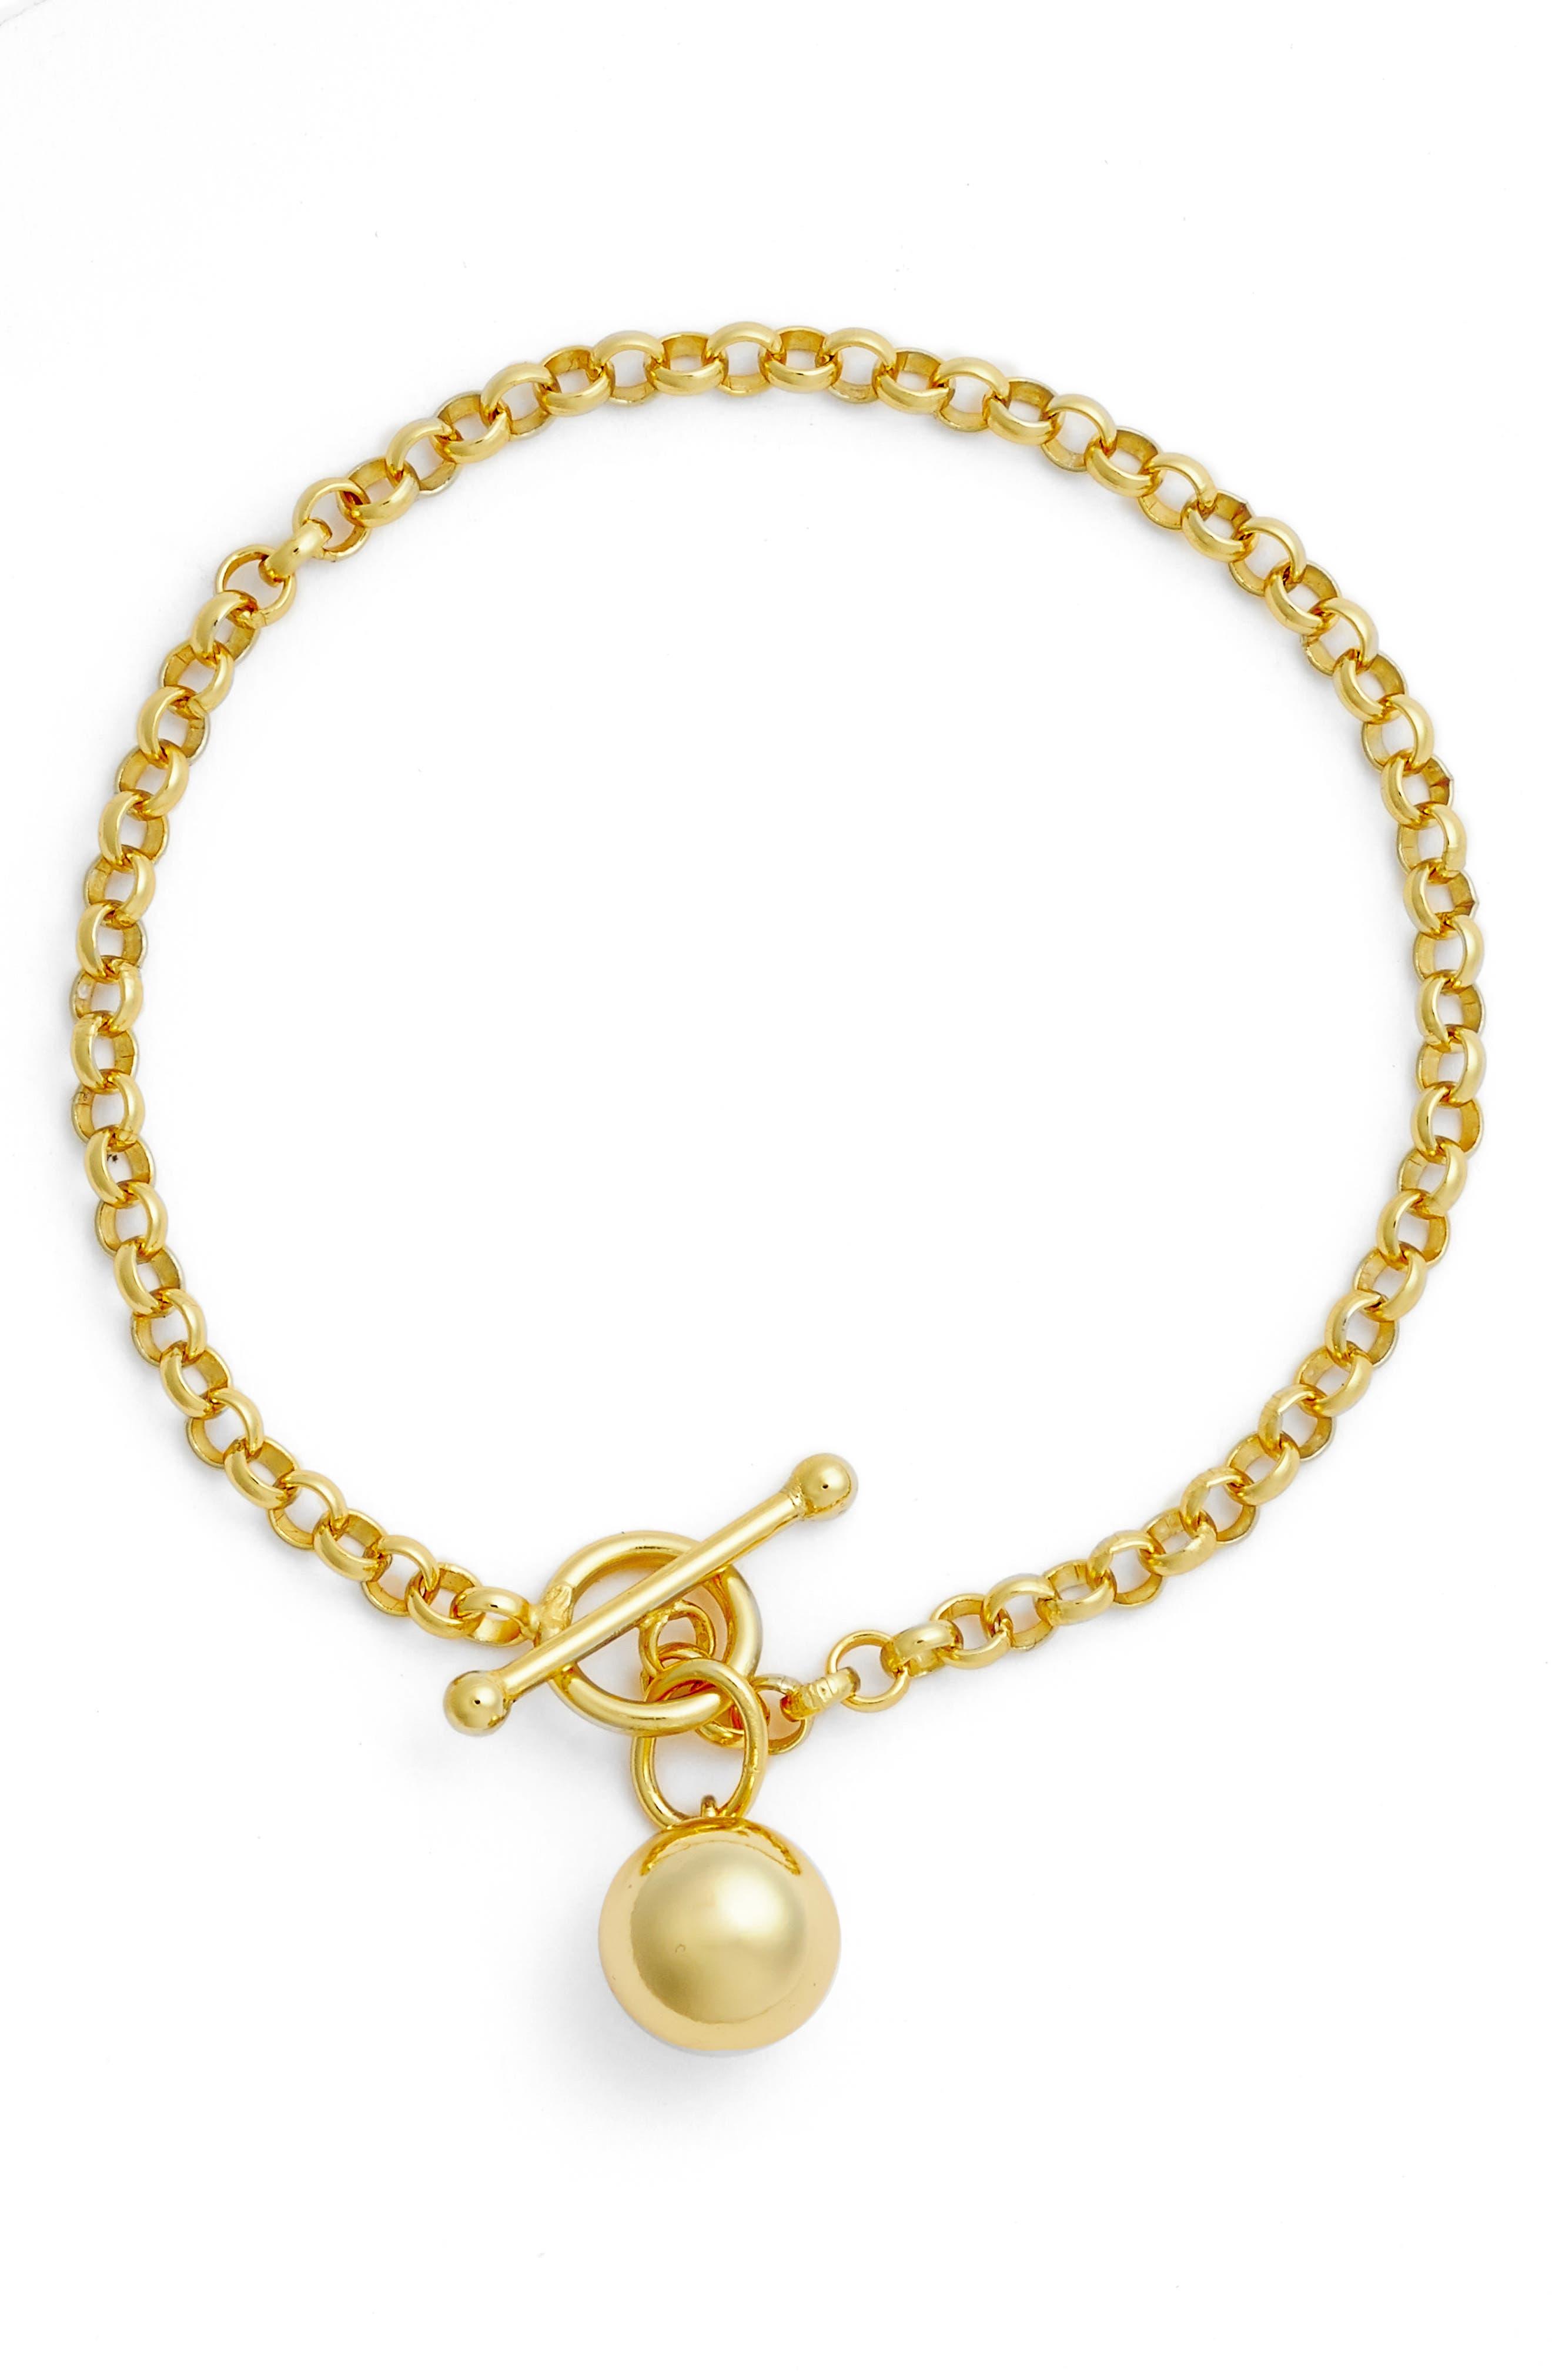 Argento Vivo Sphere Charm Link Bracelet